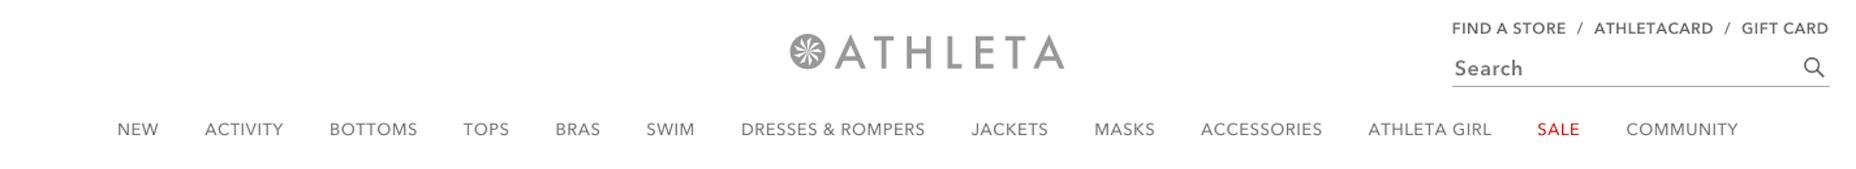 Athleta website header - branding and visual identity